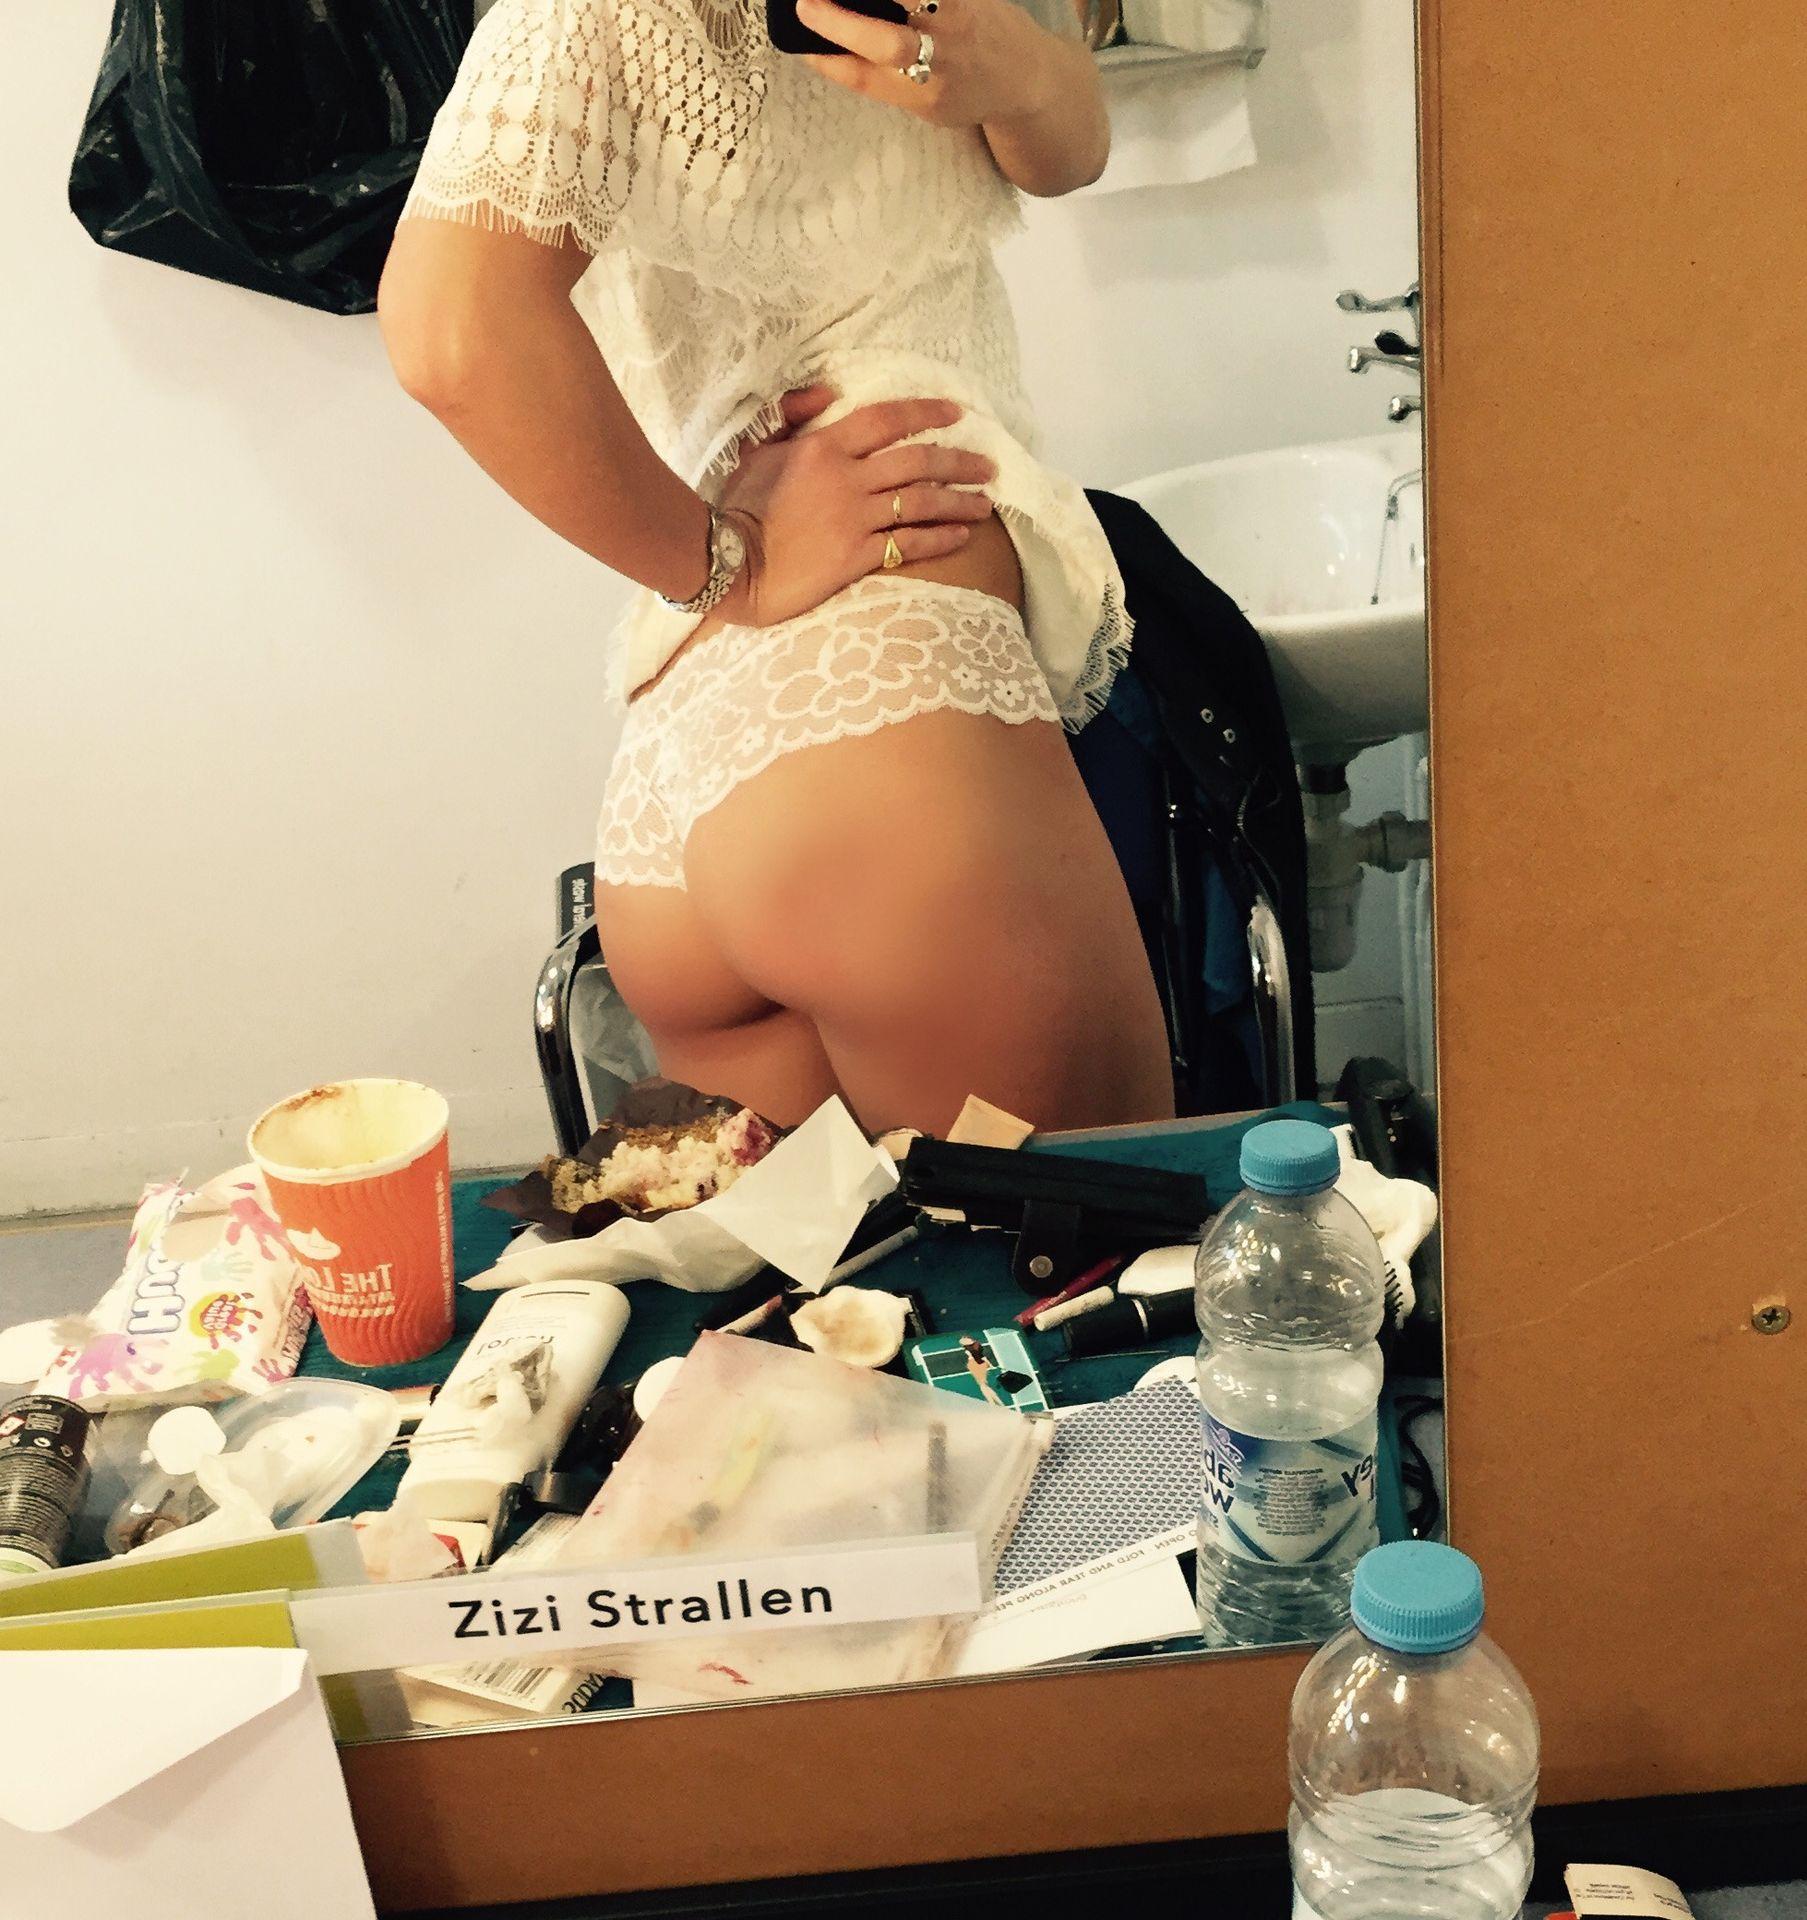 Zizi Strallen Nude Leaked The Fappening 0010